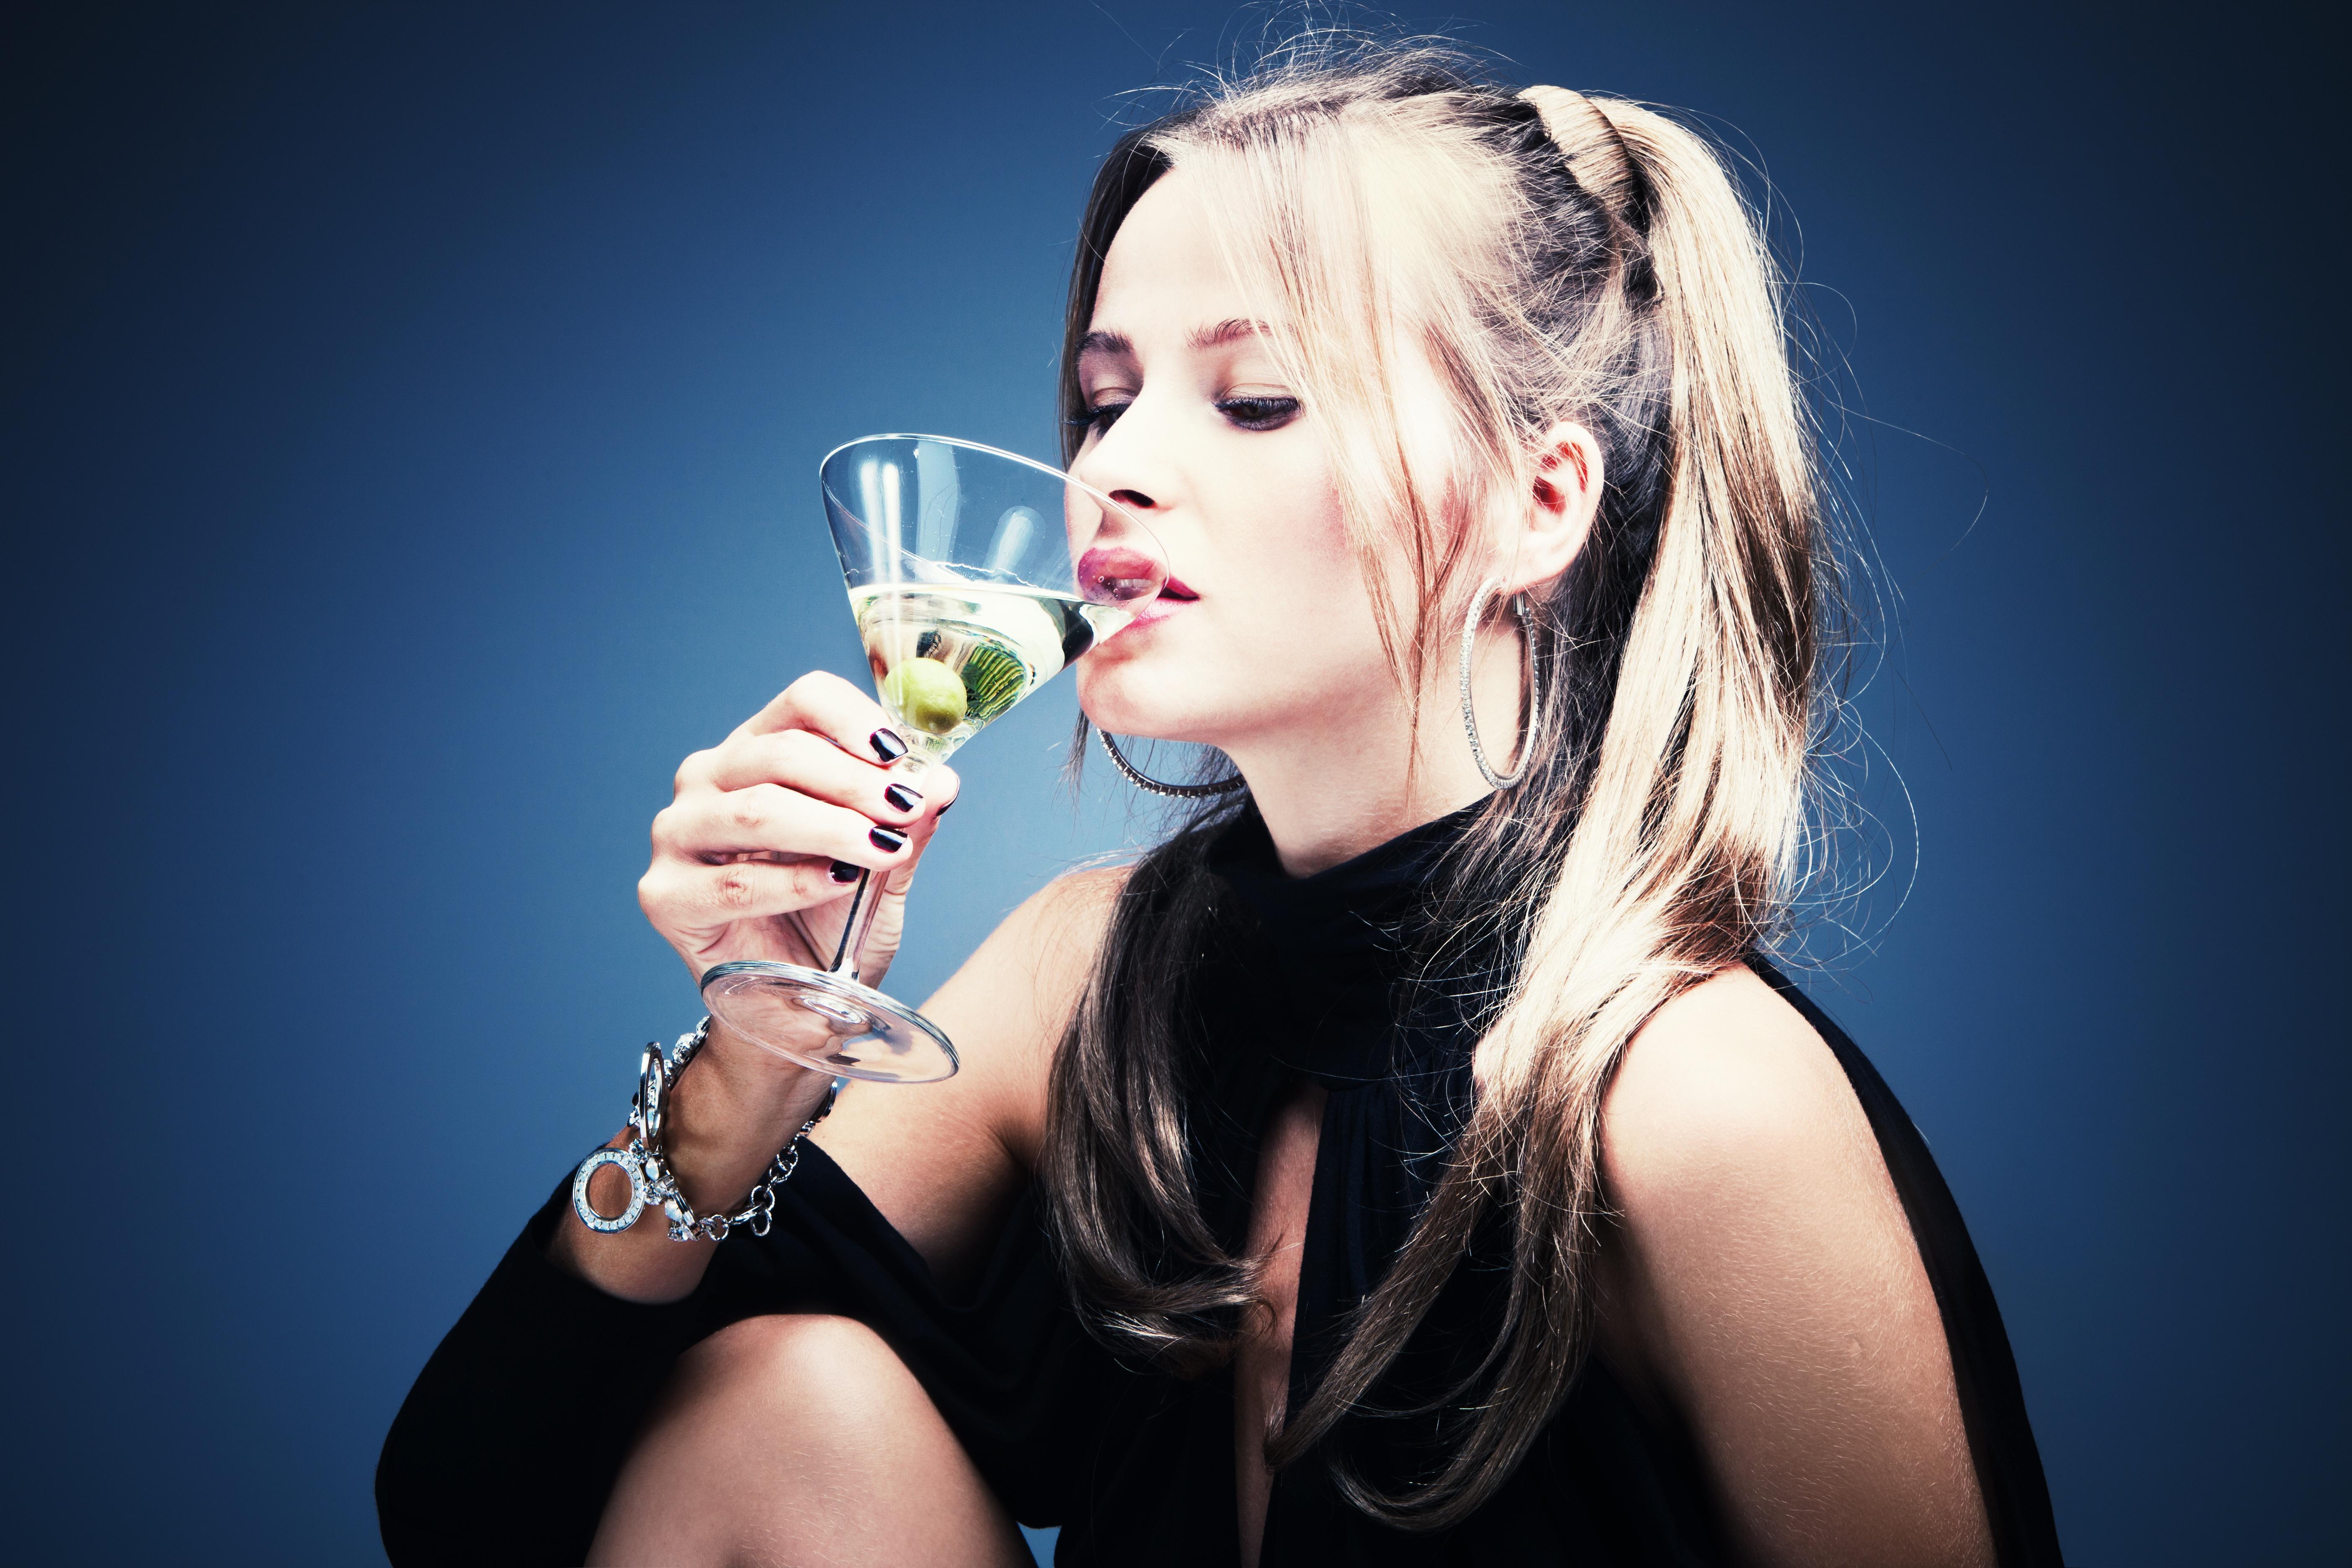 Girls drinking spunk